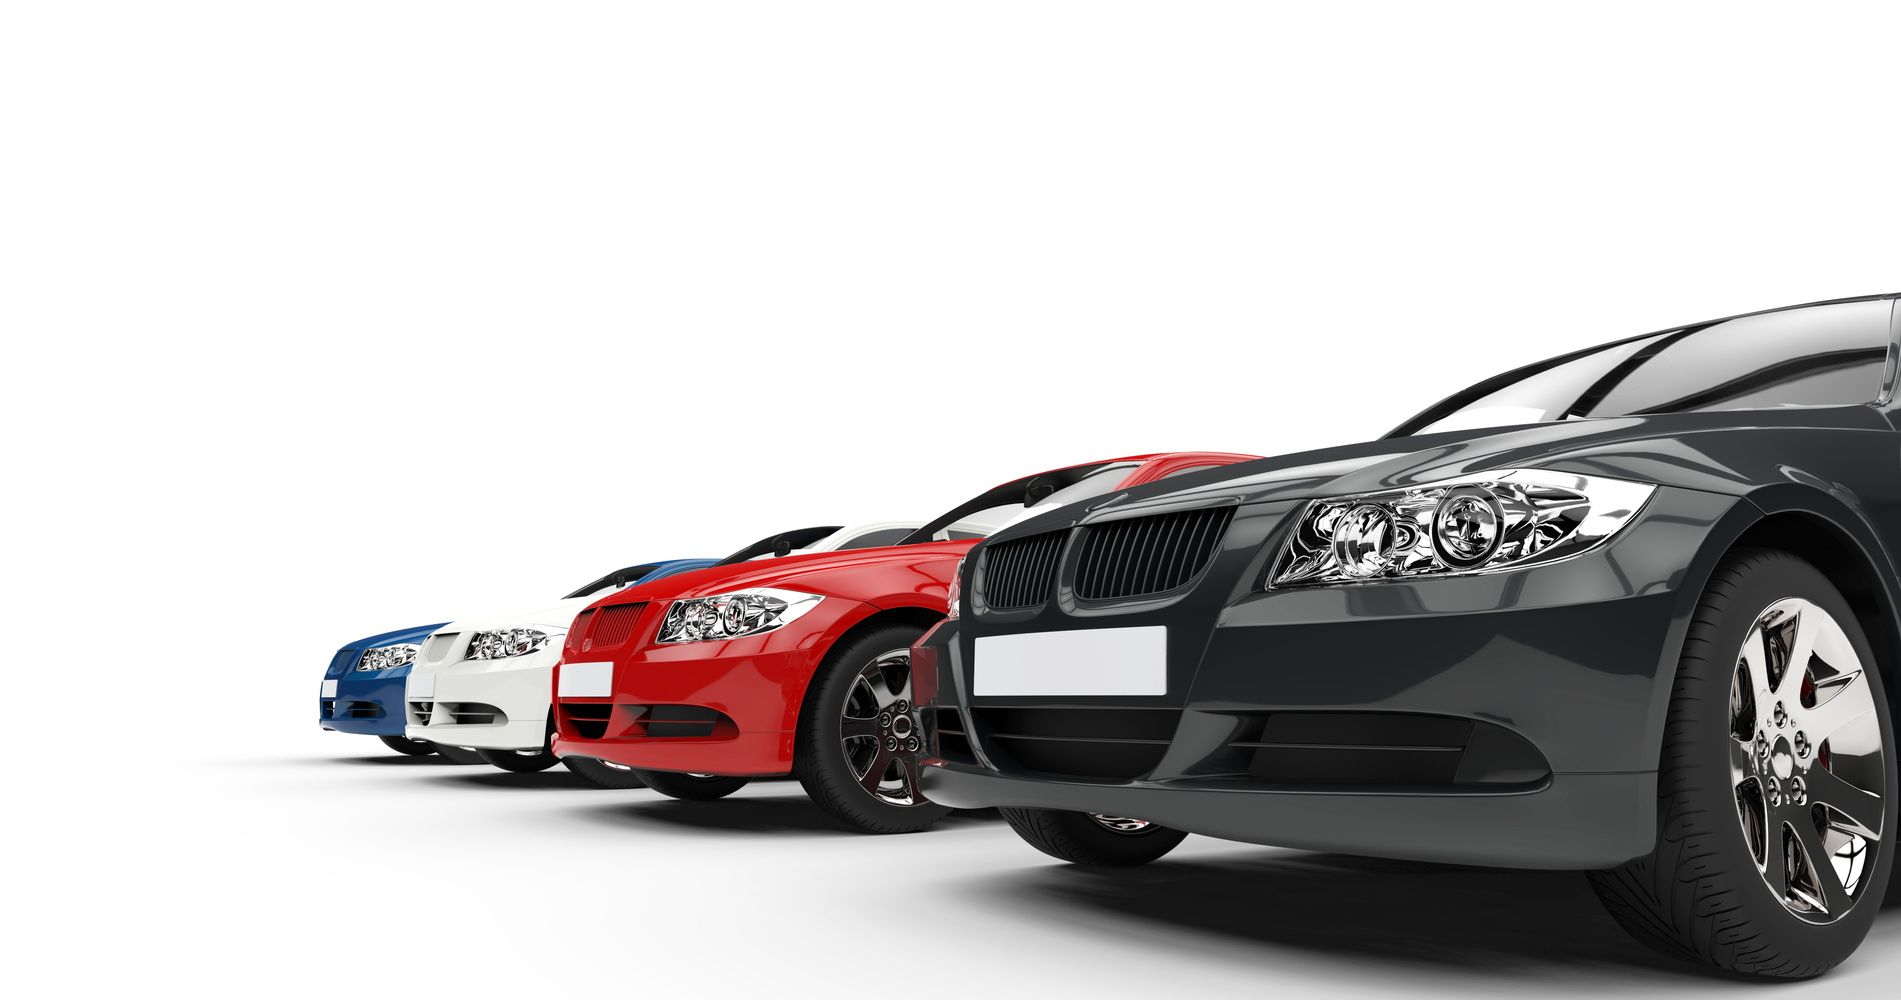 Used Cars For Sale Qatar Via Autoz Com Secound Hand Cars For